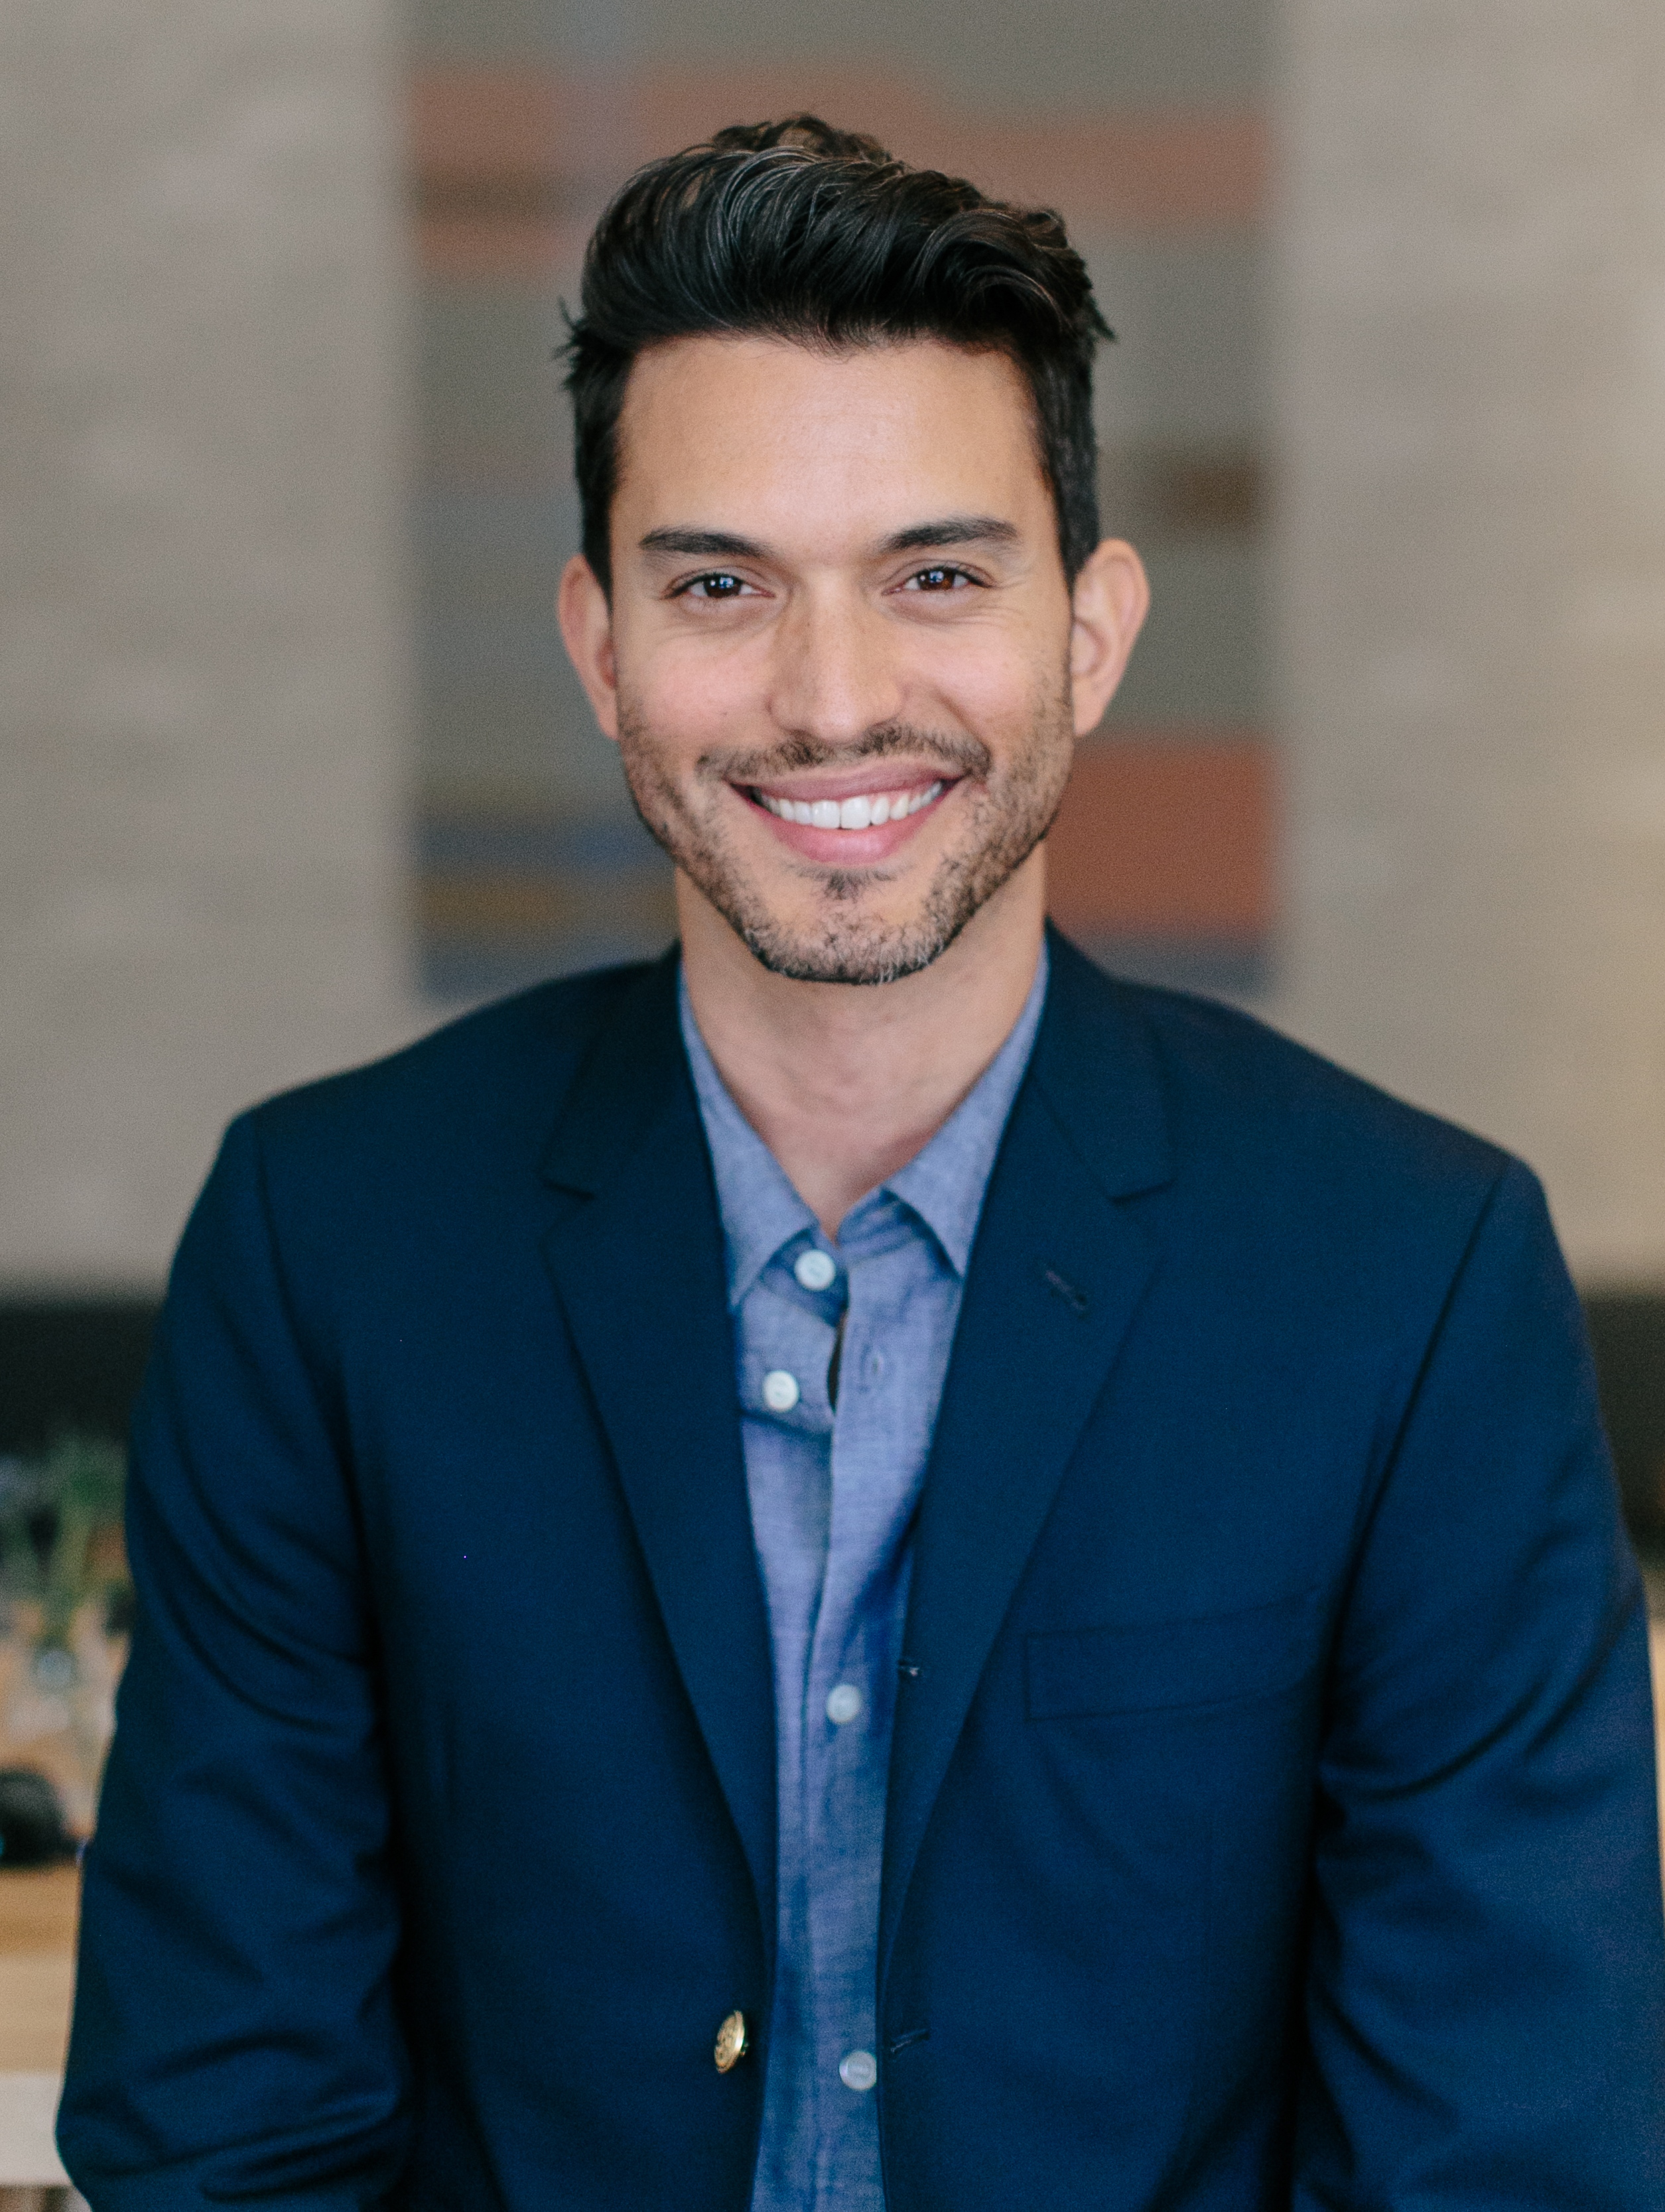 Adjunct Faculty Spotlight: David Sanchez